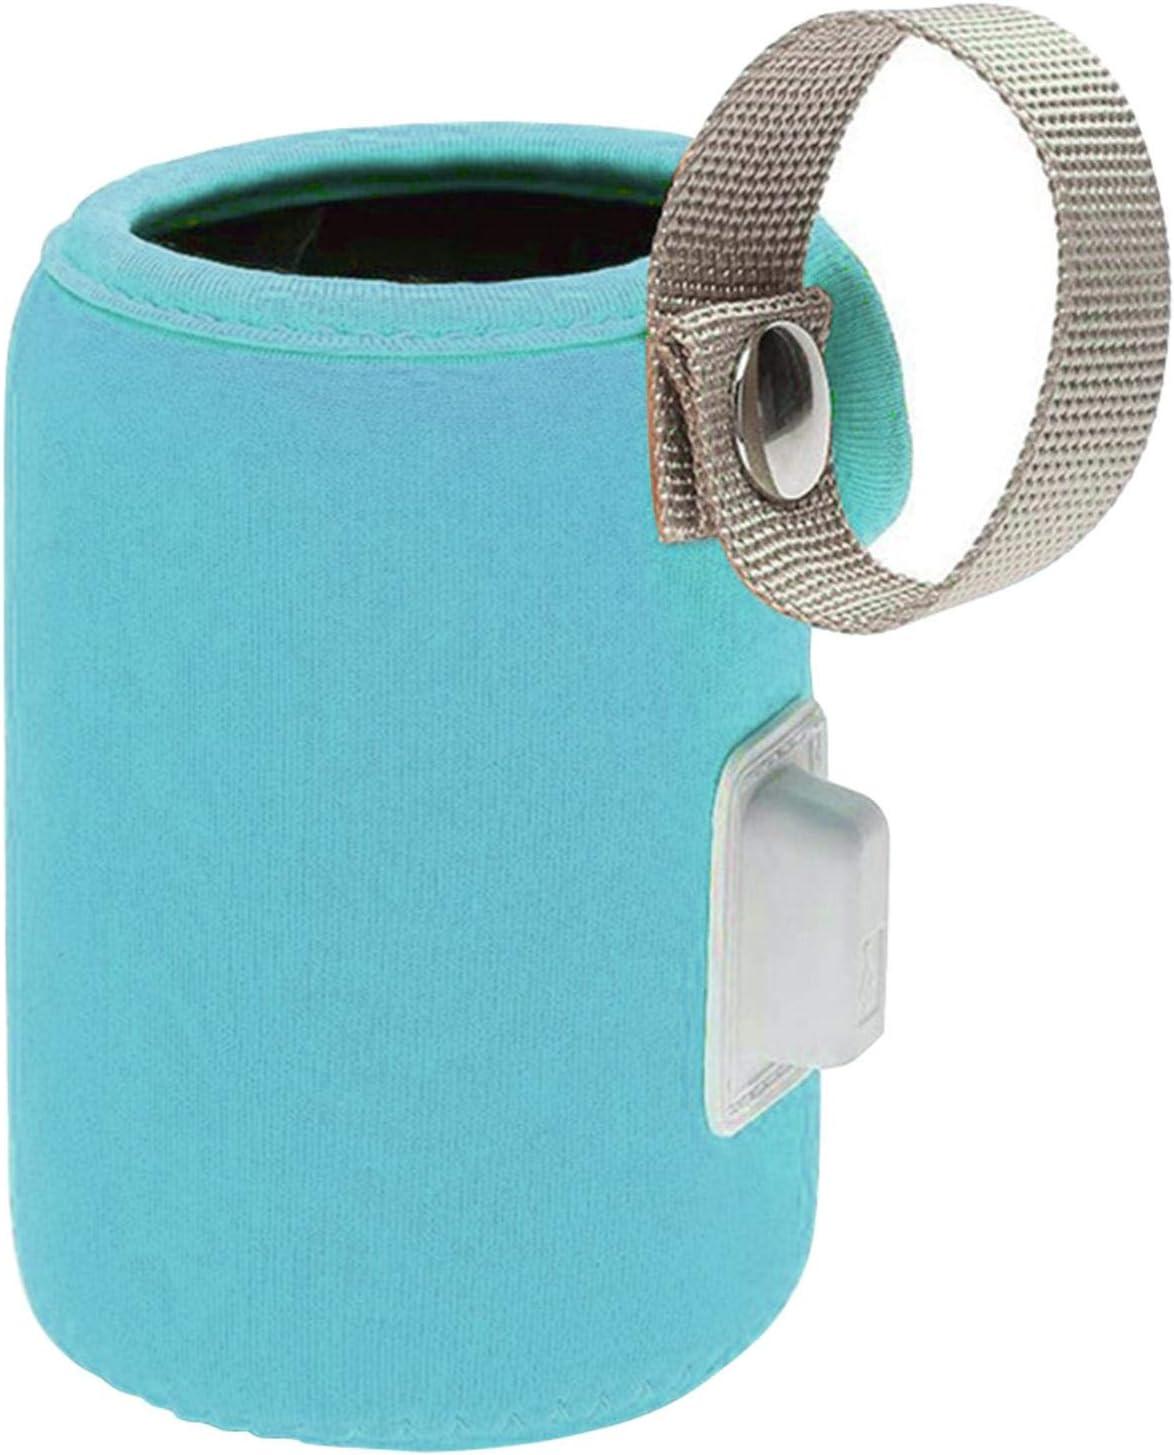 CALIDAKA USB Milk Bottle Warm,Portable Travel Baby Bottle Warmer-Cover with Handle,Multifunction Coffee Tea Mug Beverage Warming Bag